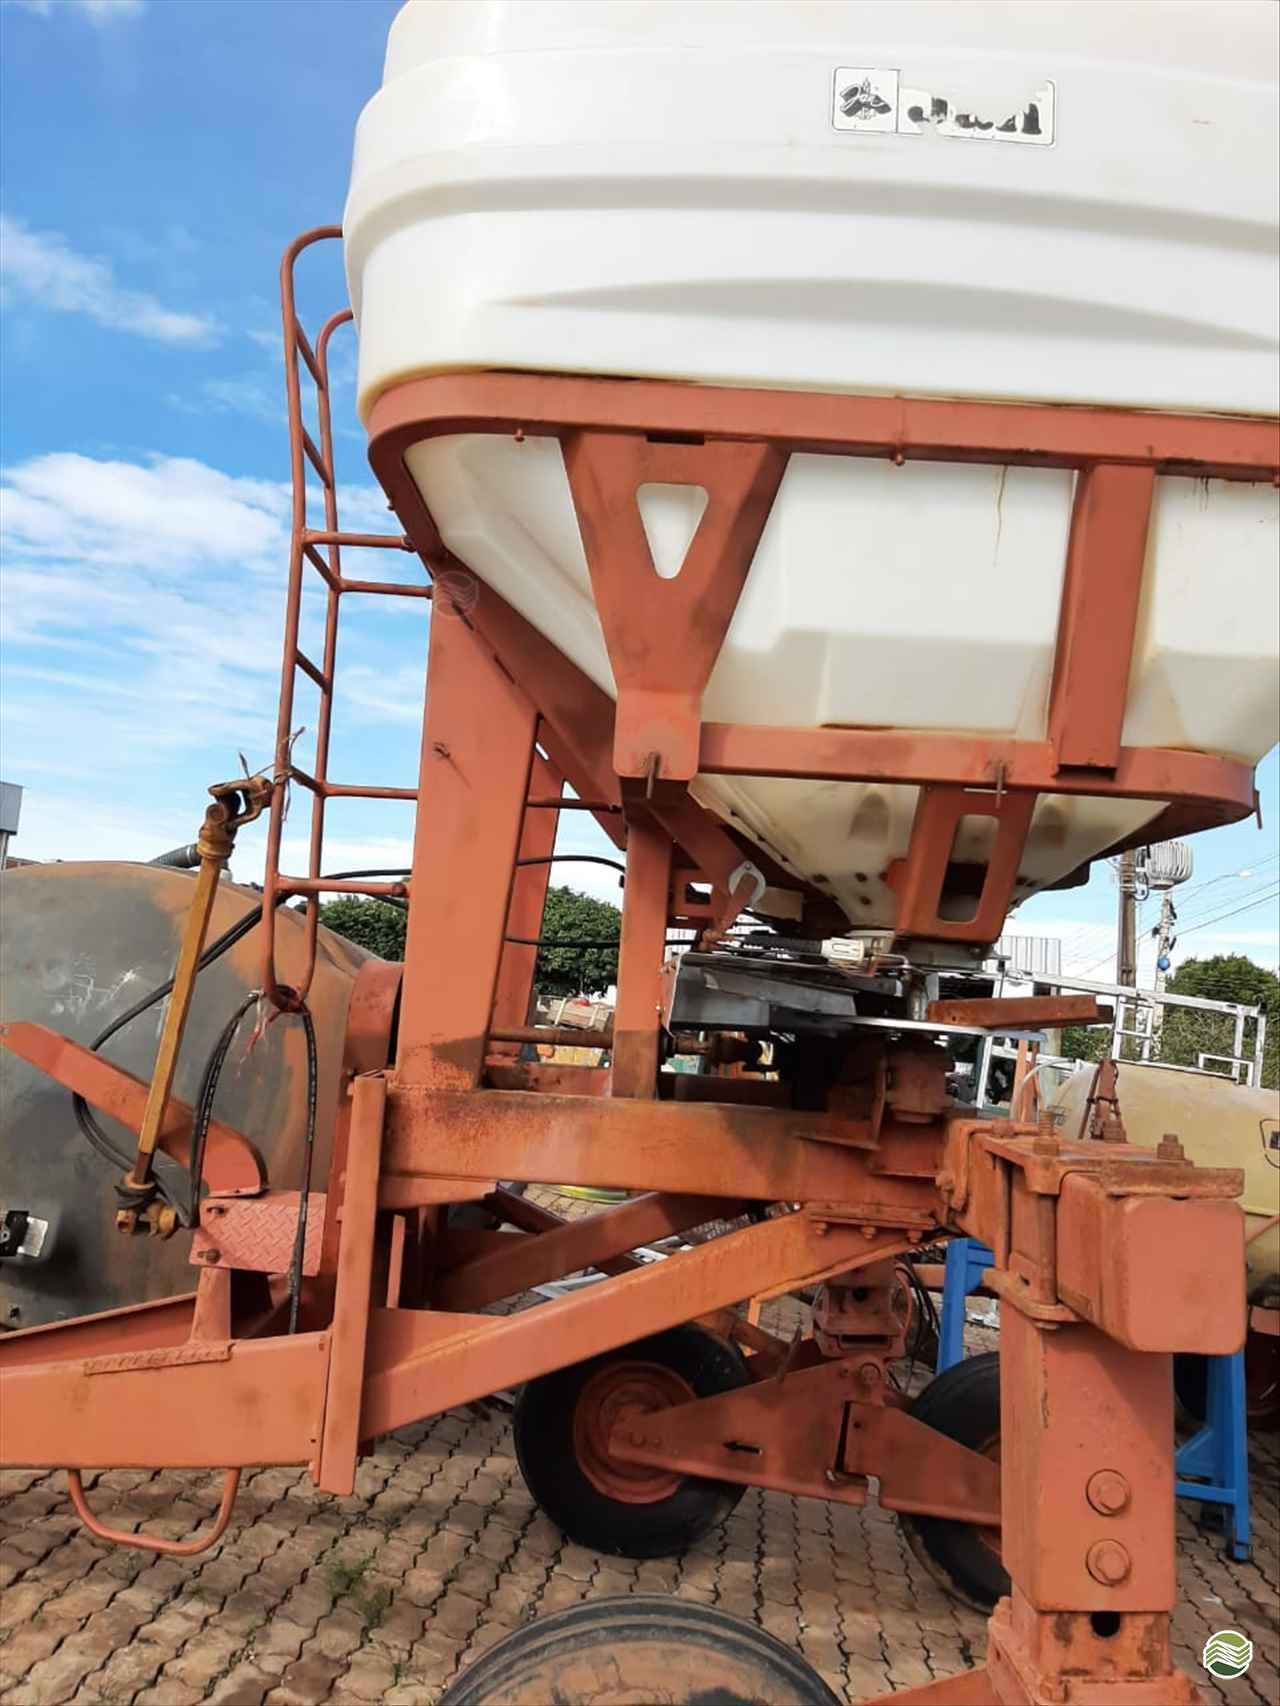 IMPLEMENTOS AGRICOLAS DISTRIBUIDOR CALCÁRIO 5000 Kg Guimáquina Implementos Agrícolas - Jacto RONDONOPOLIS MATO GROSSO MT